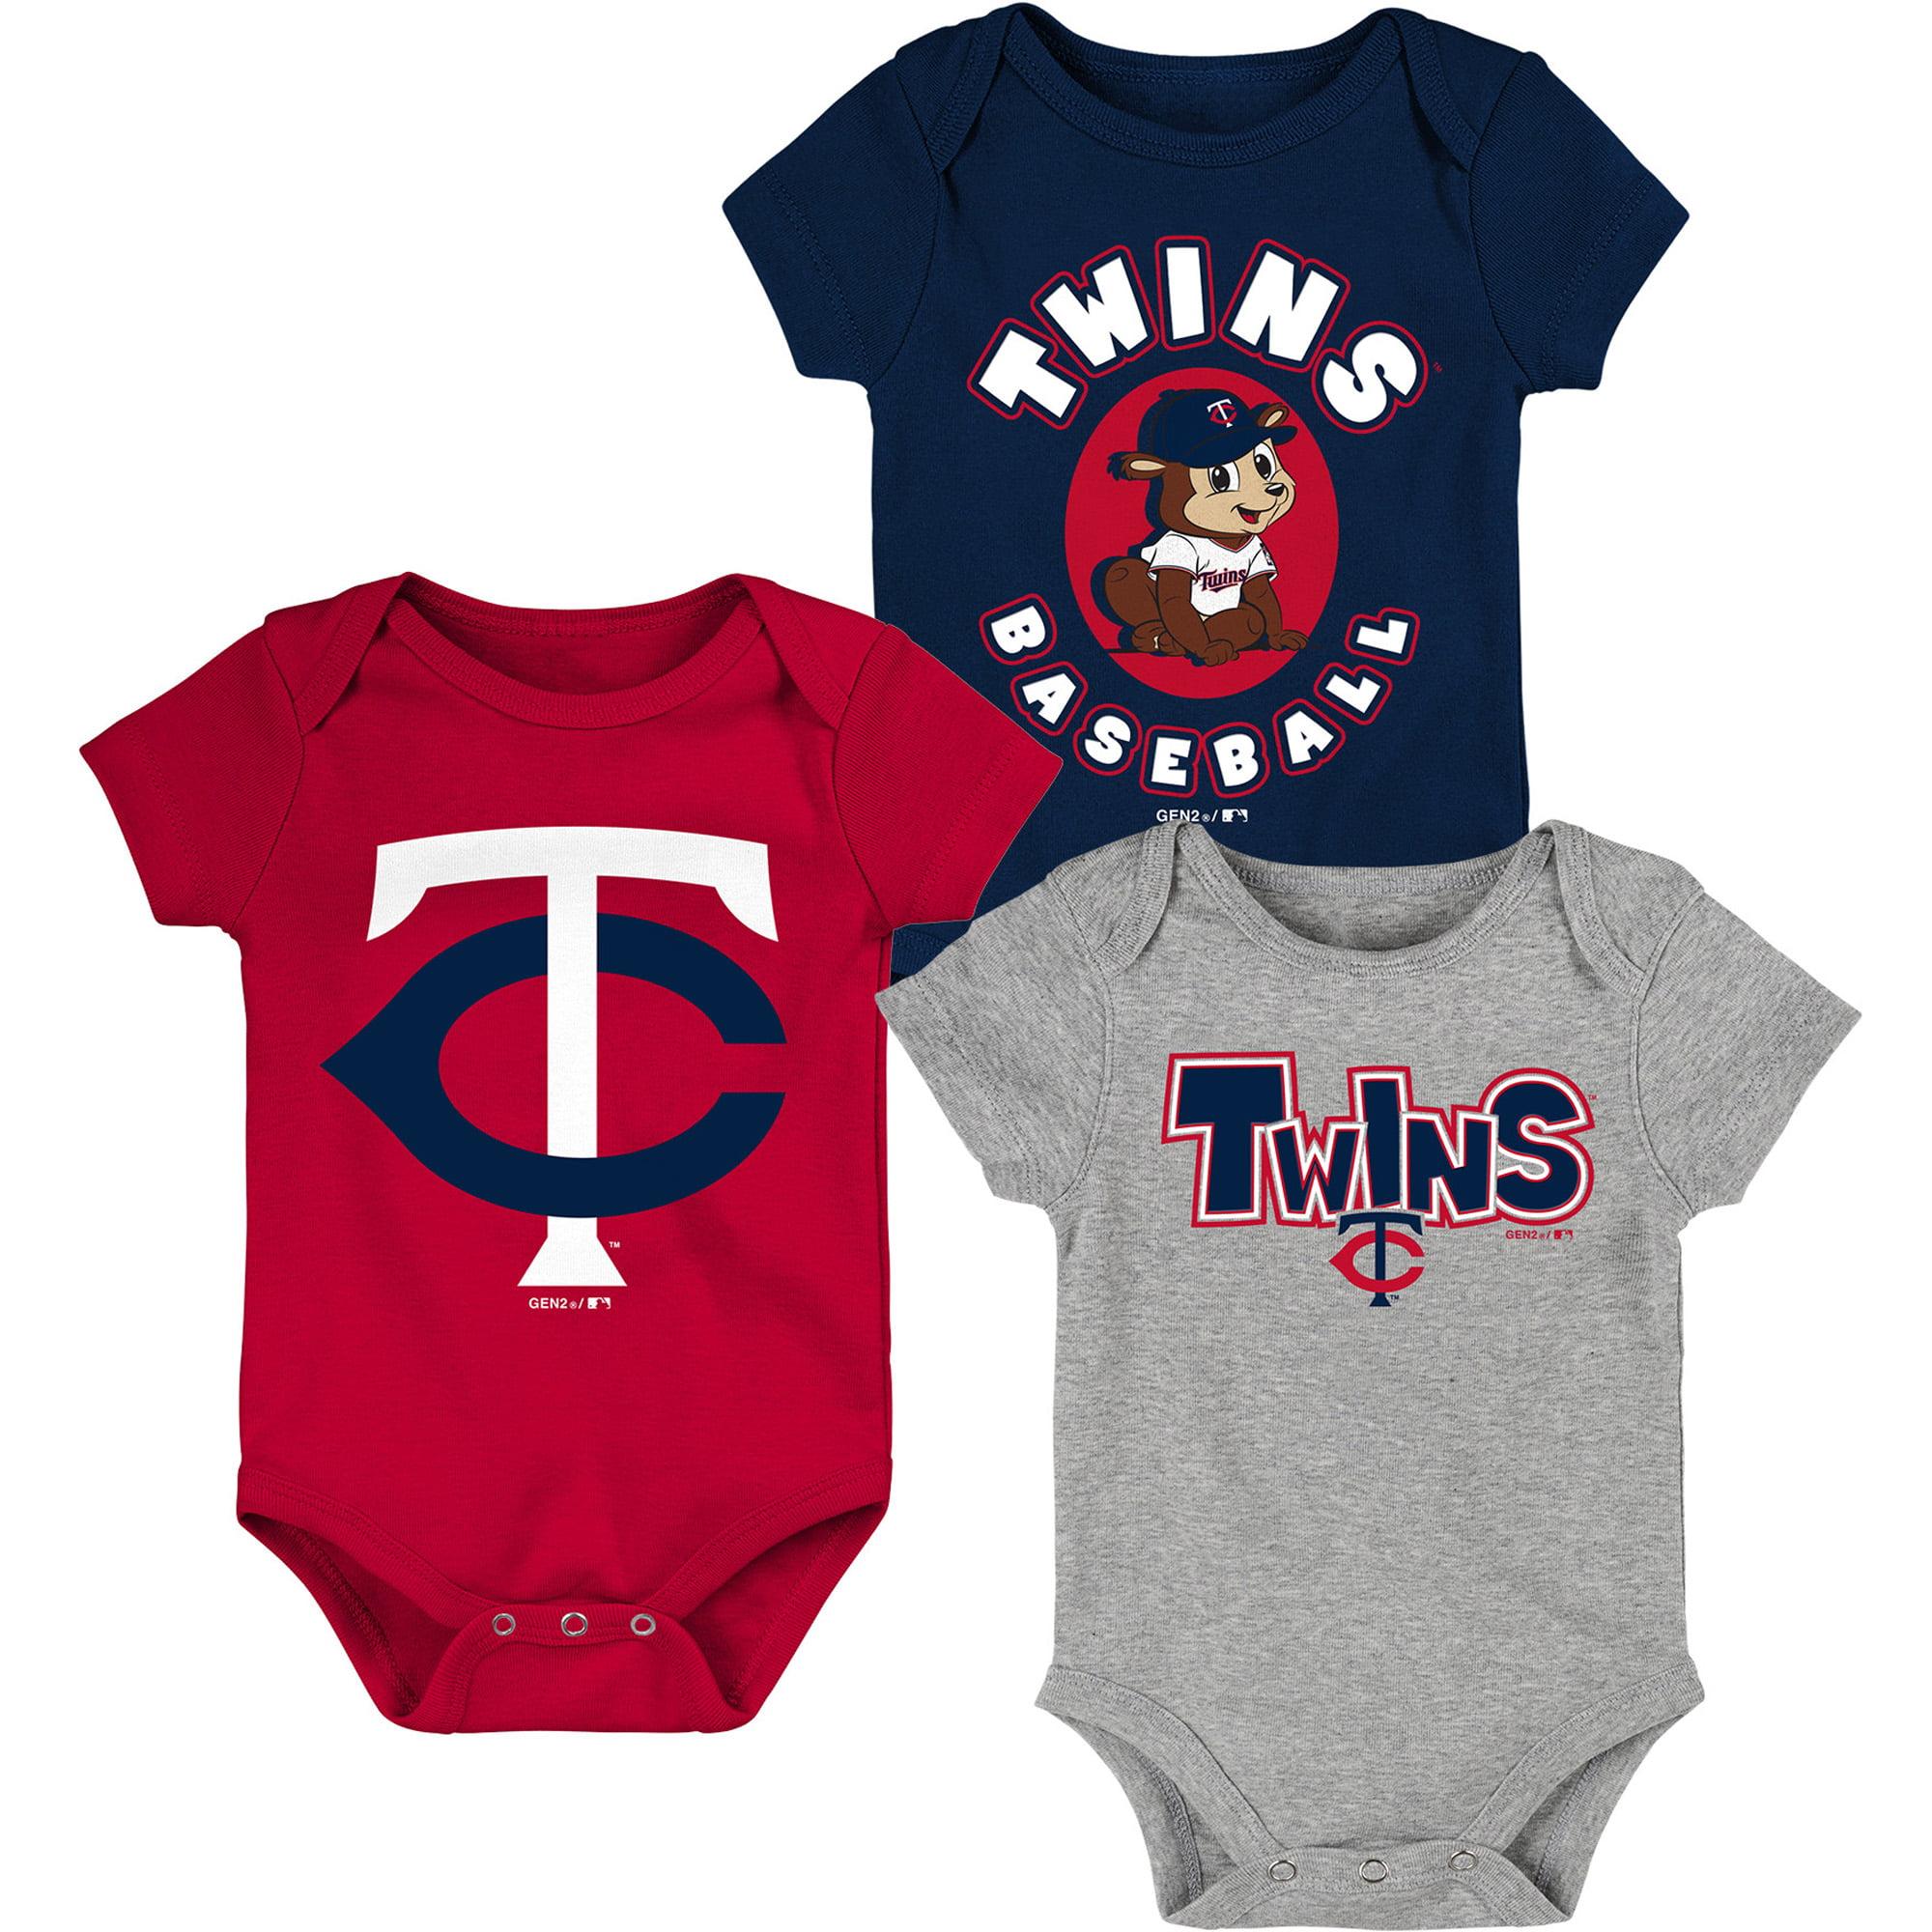 Minnesota Twins Infant Everyday Fan Three-Pack Bodysuit Set - Navy/Red/Heathered Gray